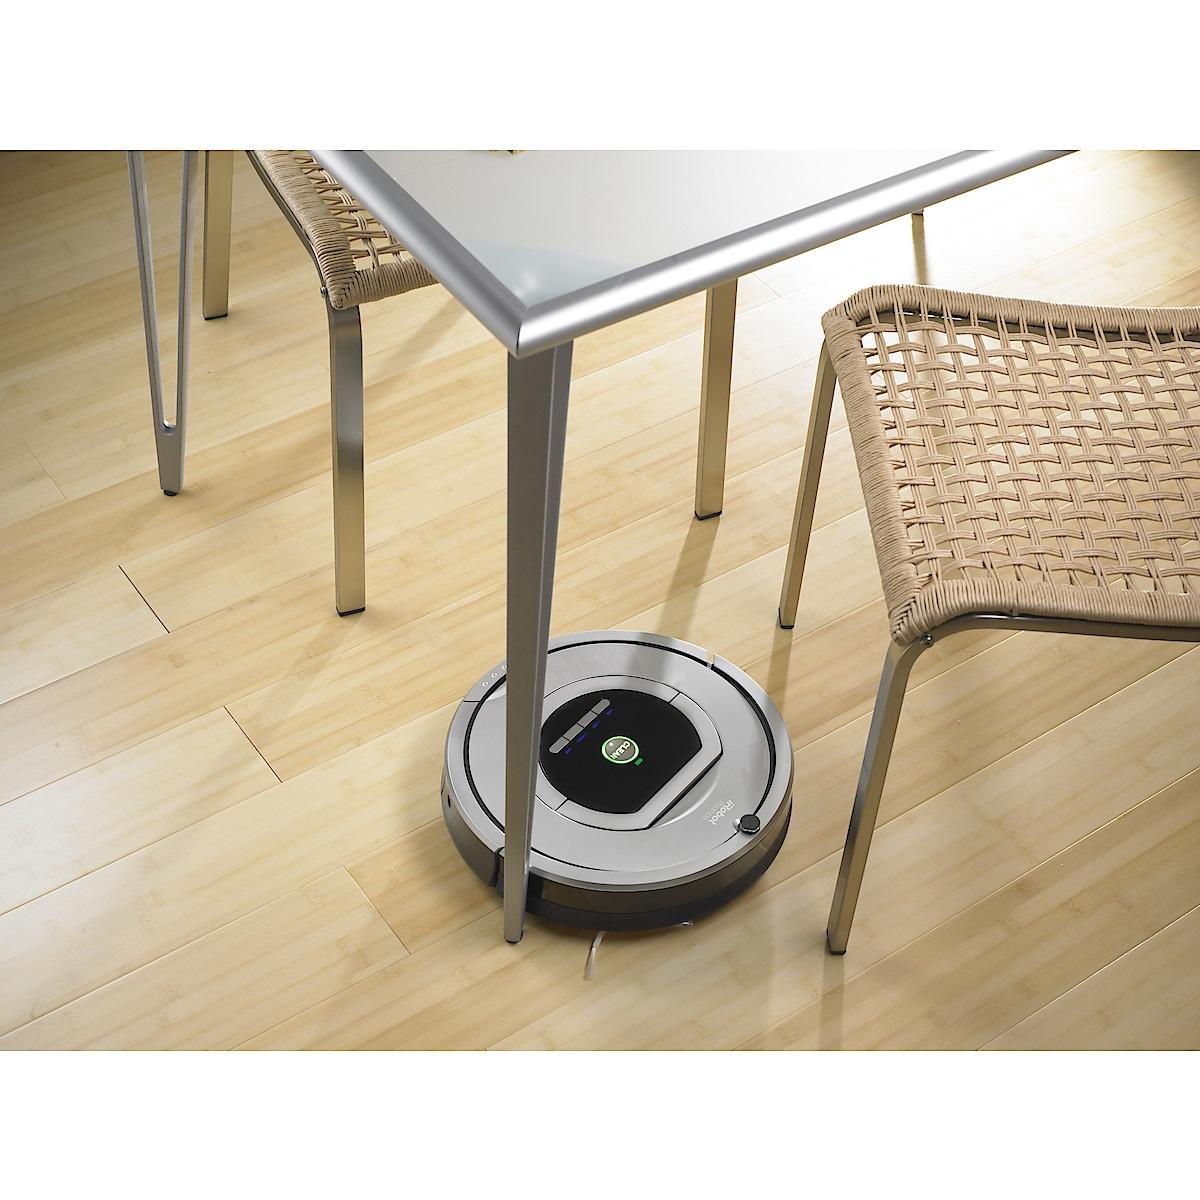 iRobot Roomba 760, robotstøvsuger